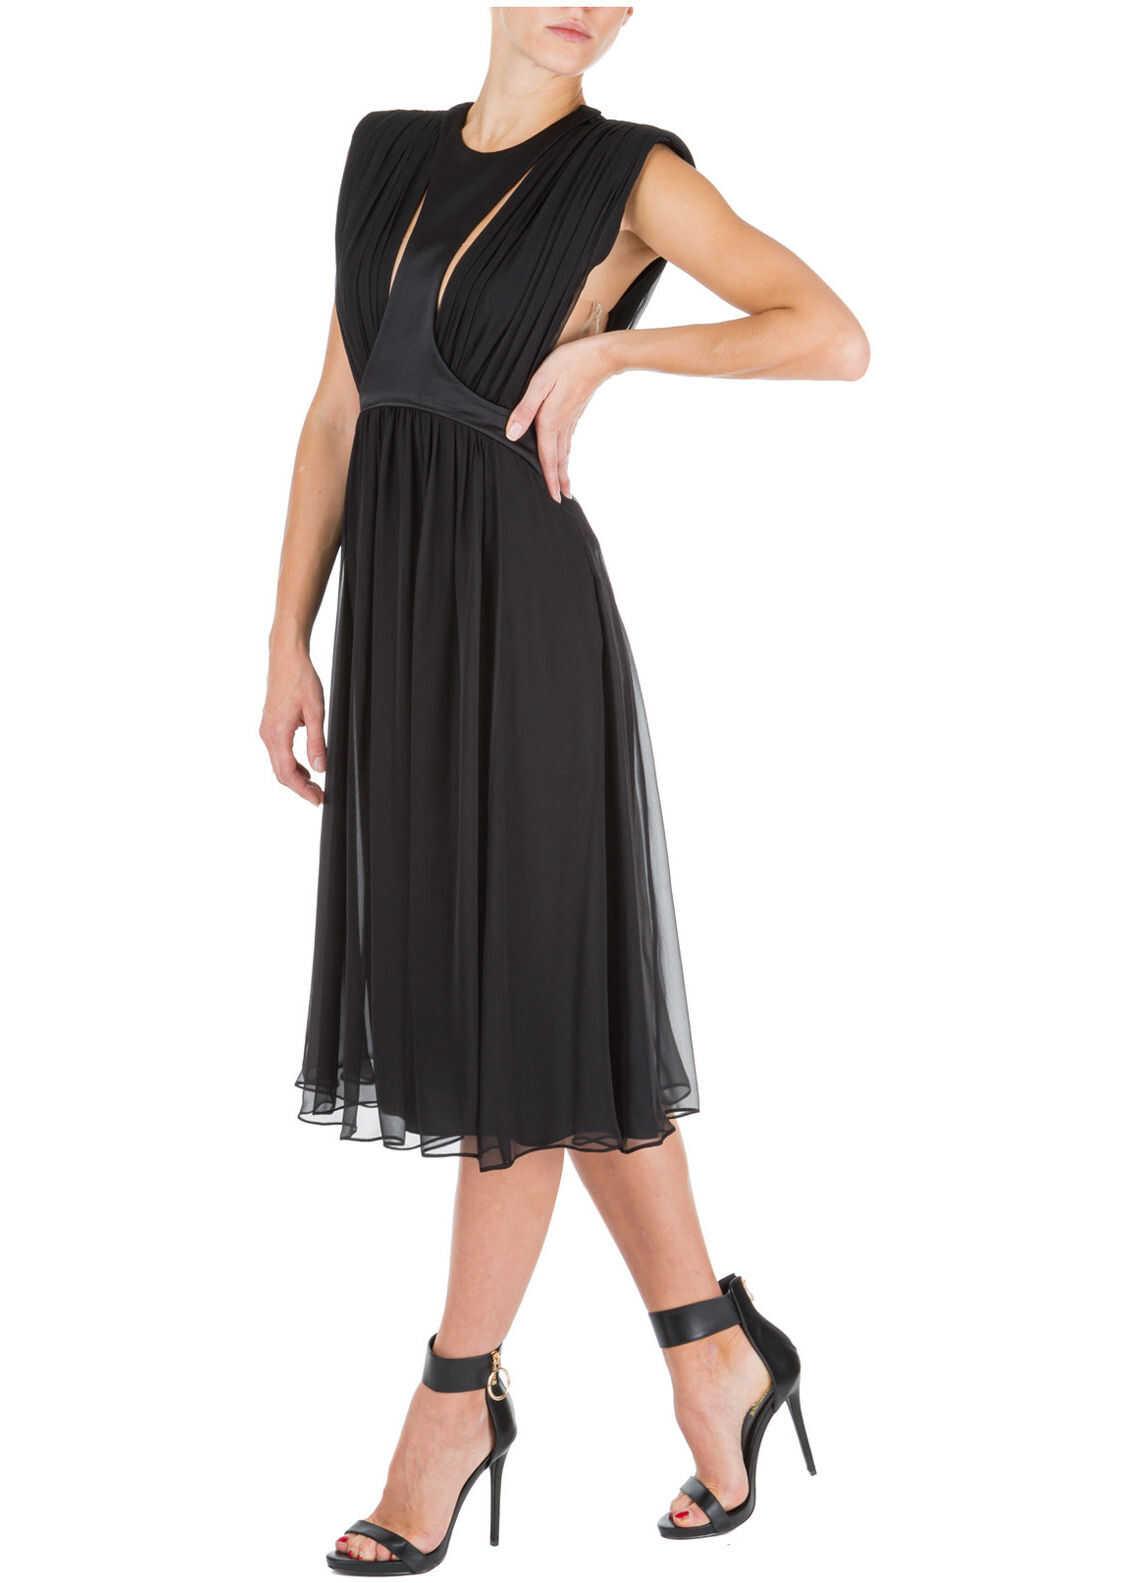 Alberta Ferretti Dress Sleeveless V045951140555 Black image0